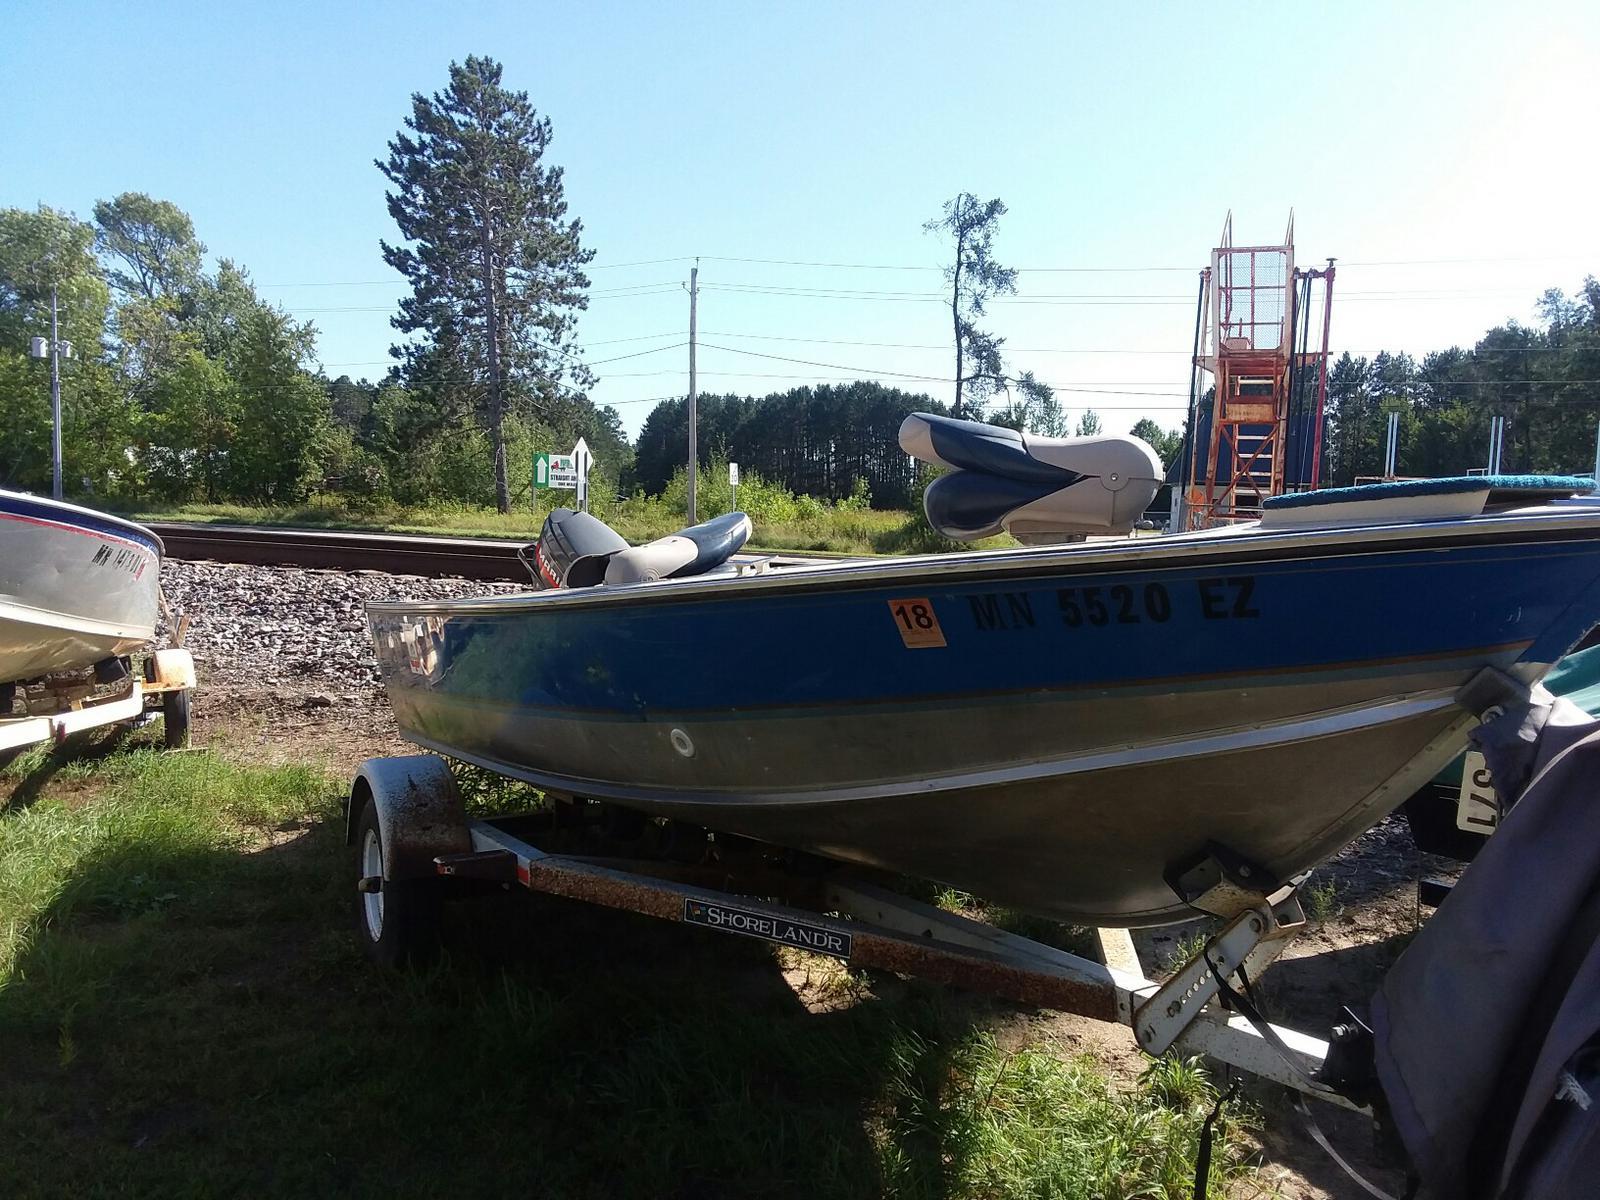 Boats Grand Rapids Marine Grand Rapids, MN (218) 326-0351